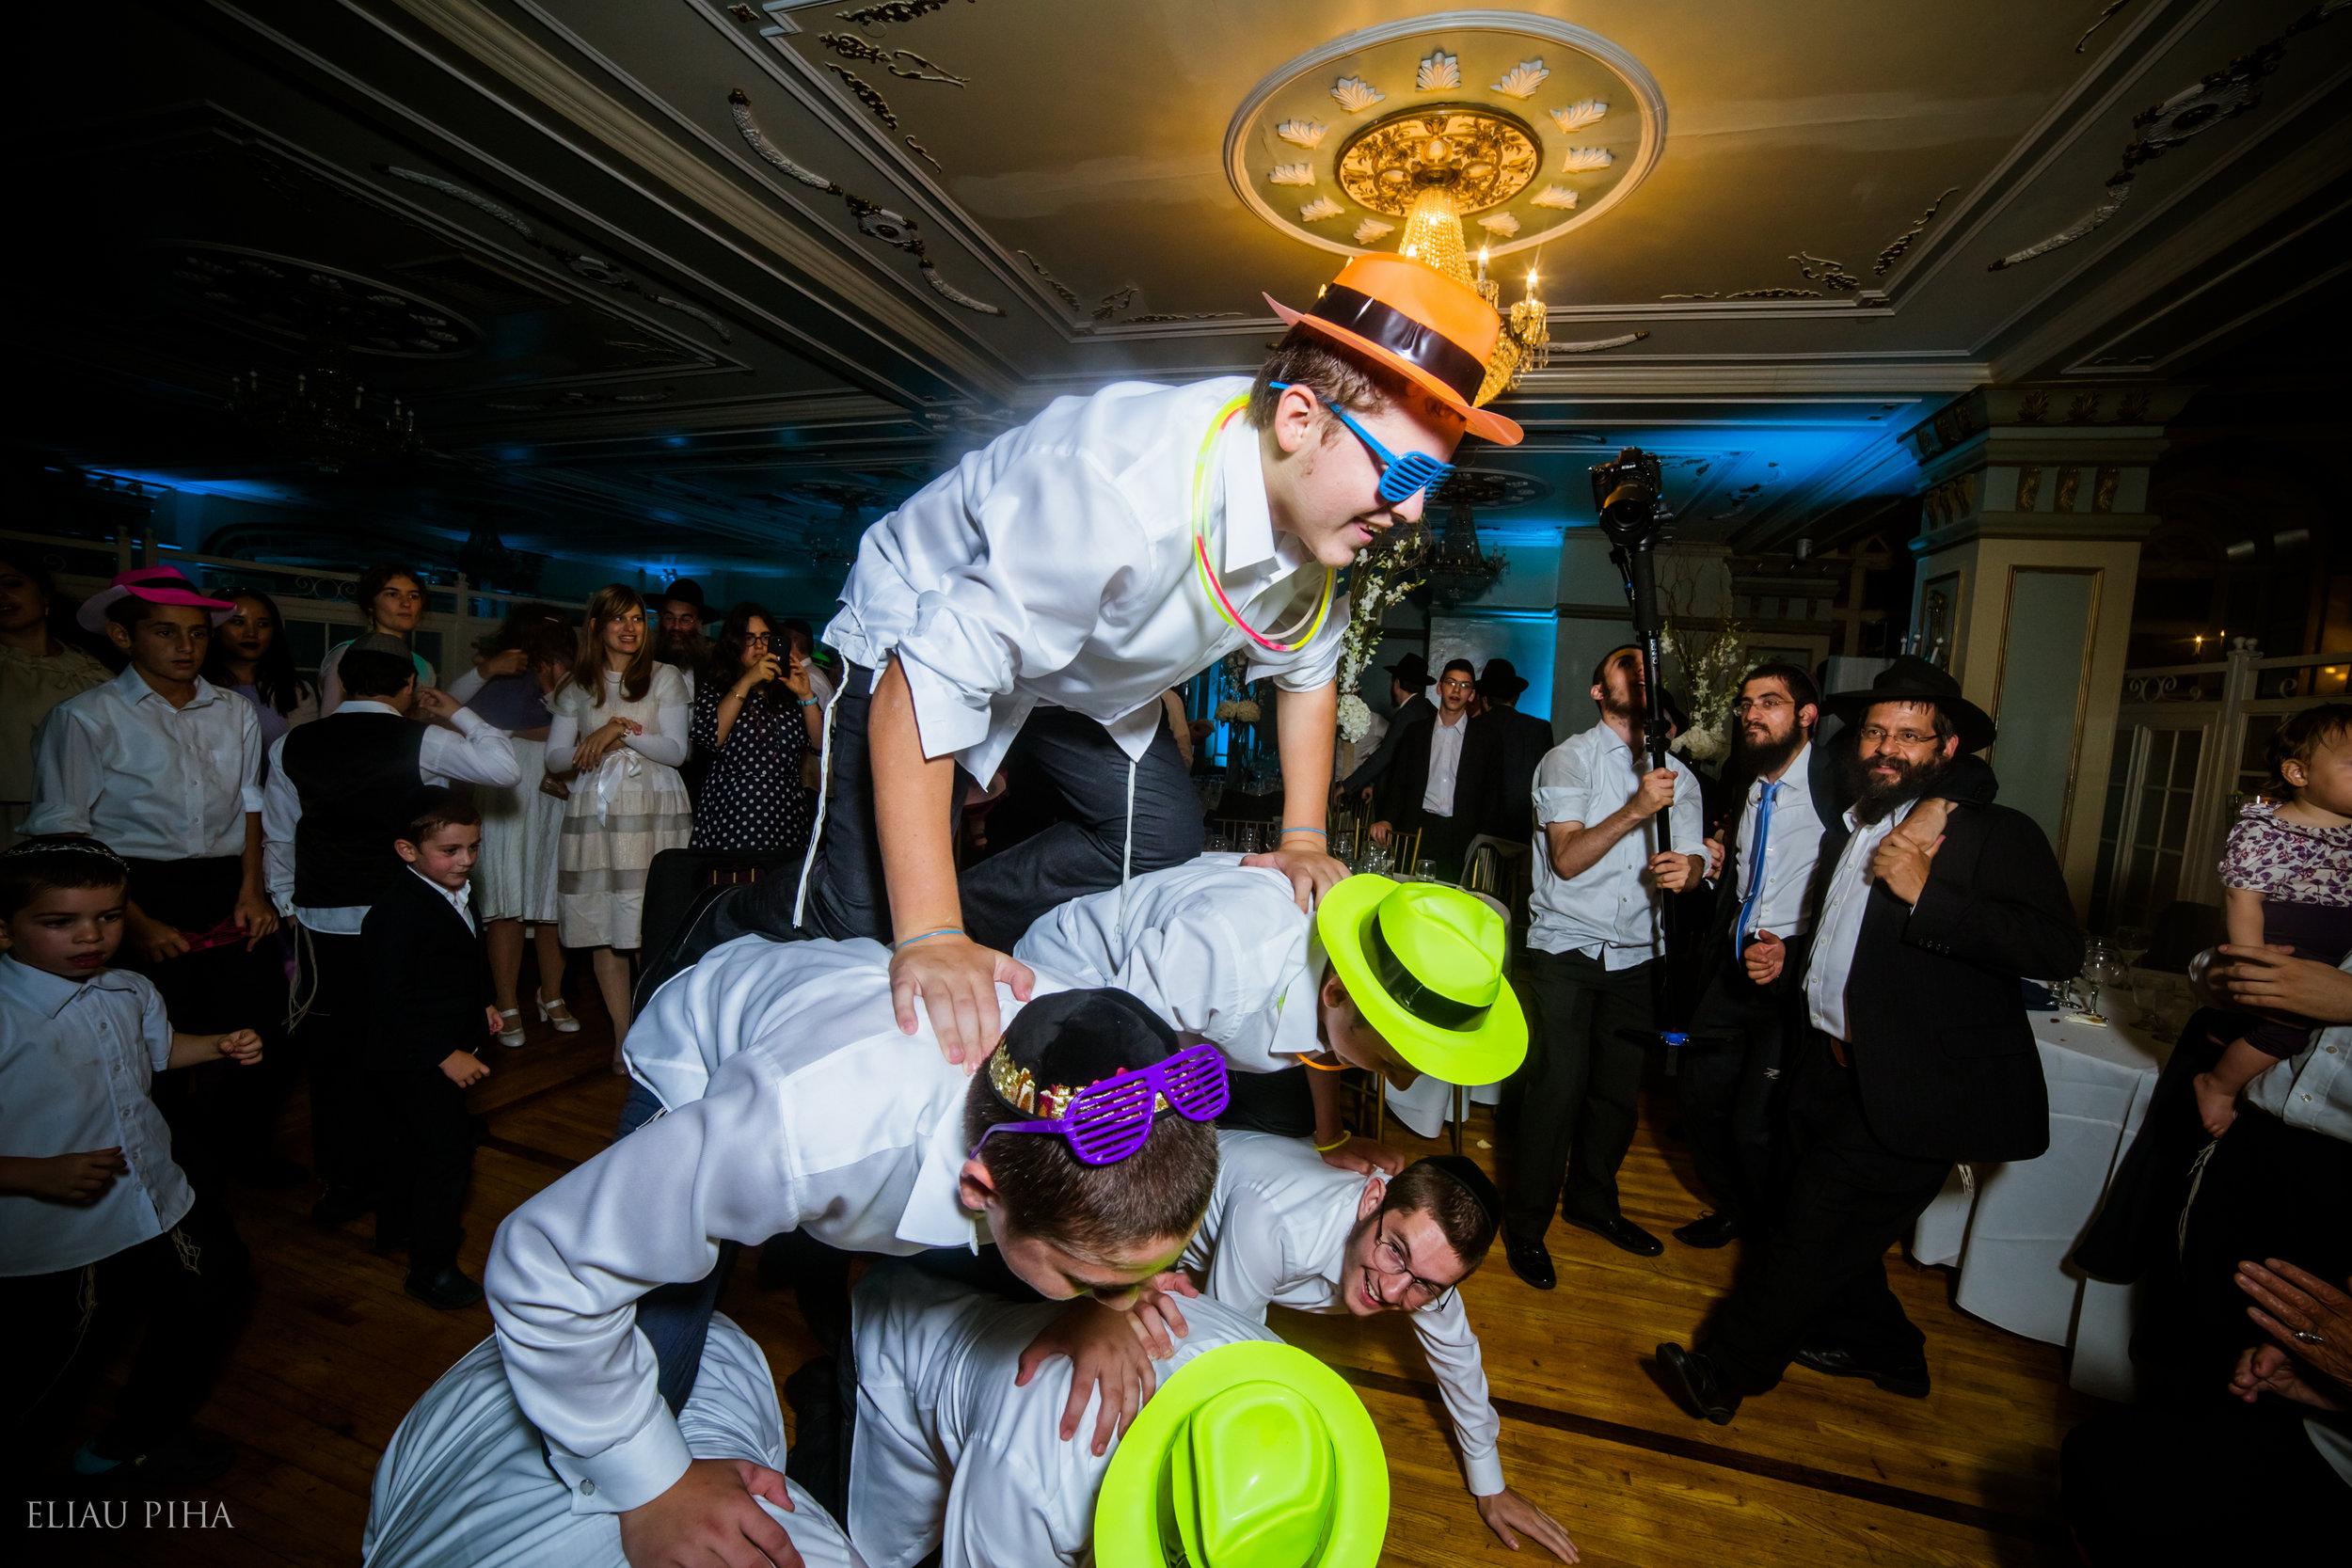 Bar Mitzvah Meir Sandman - photography, new york, events, people -0526.jpg